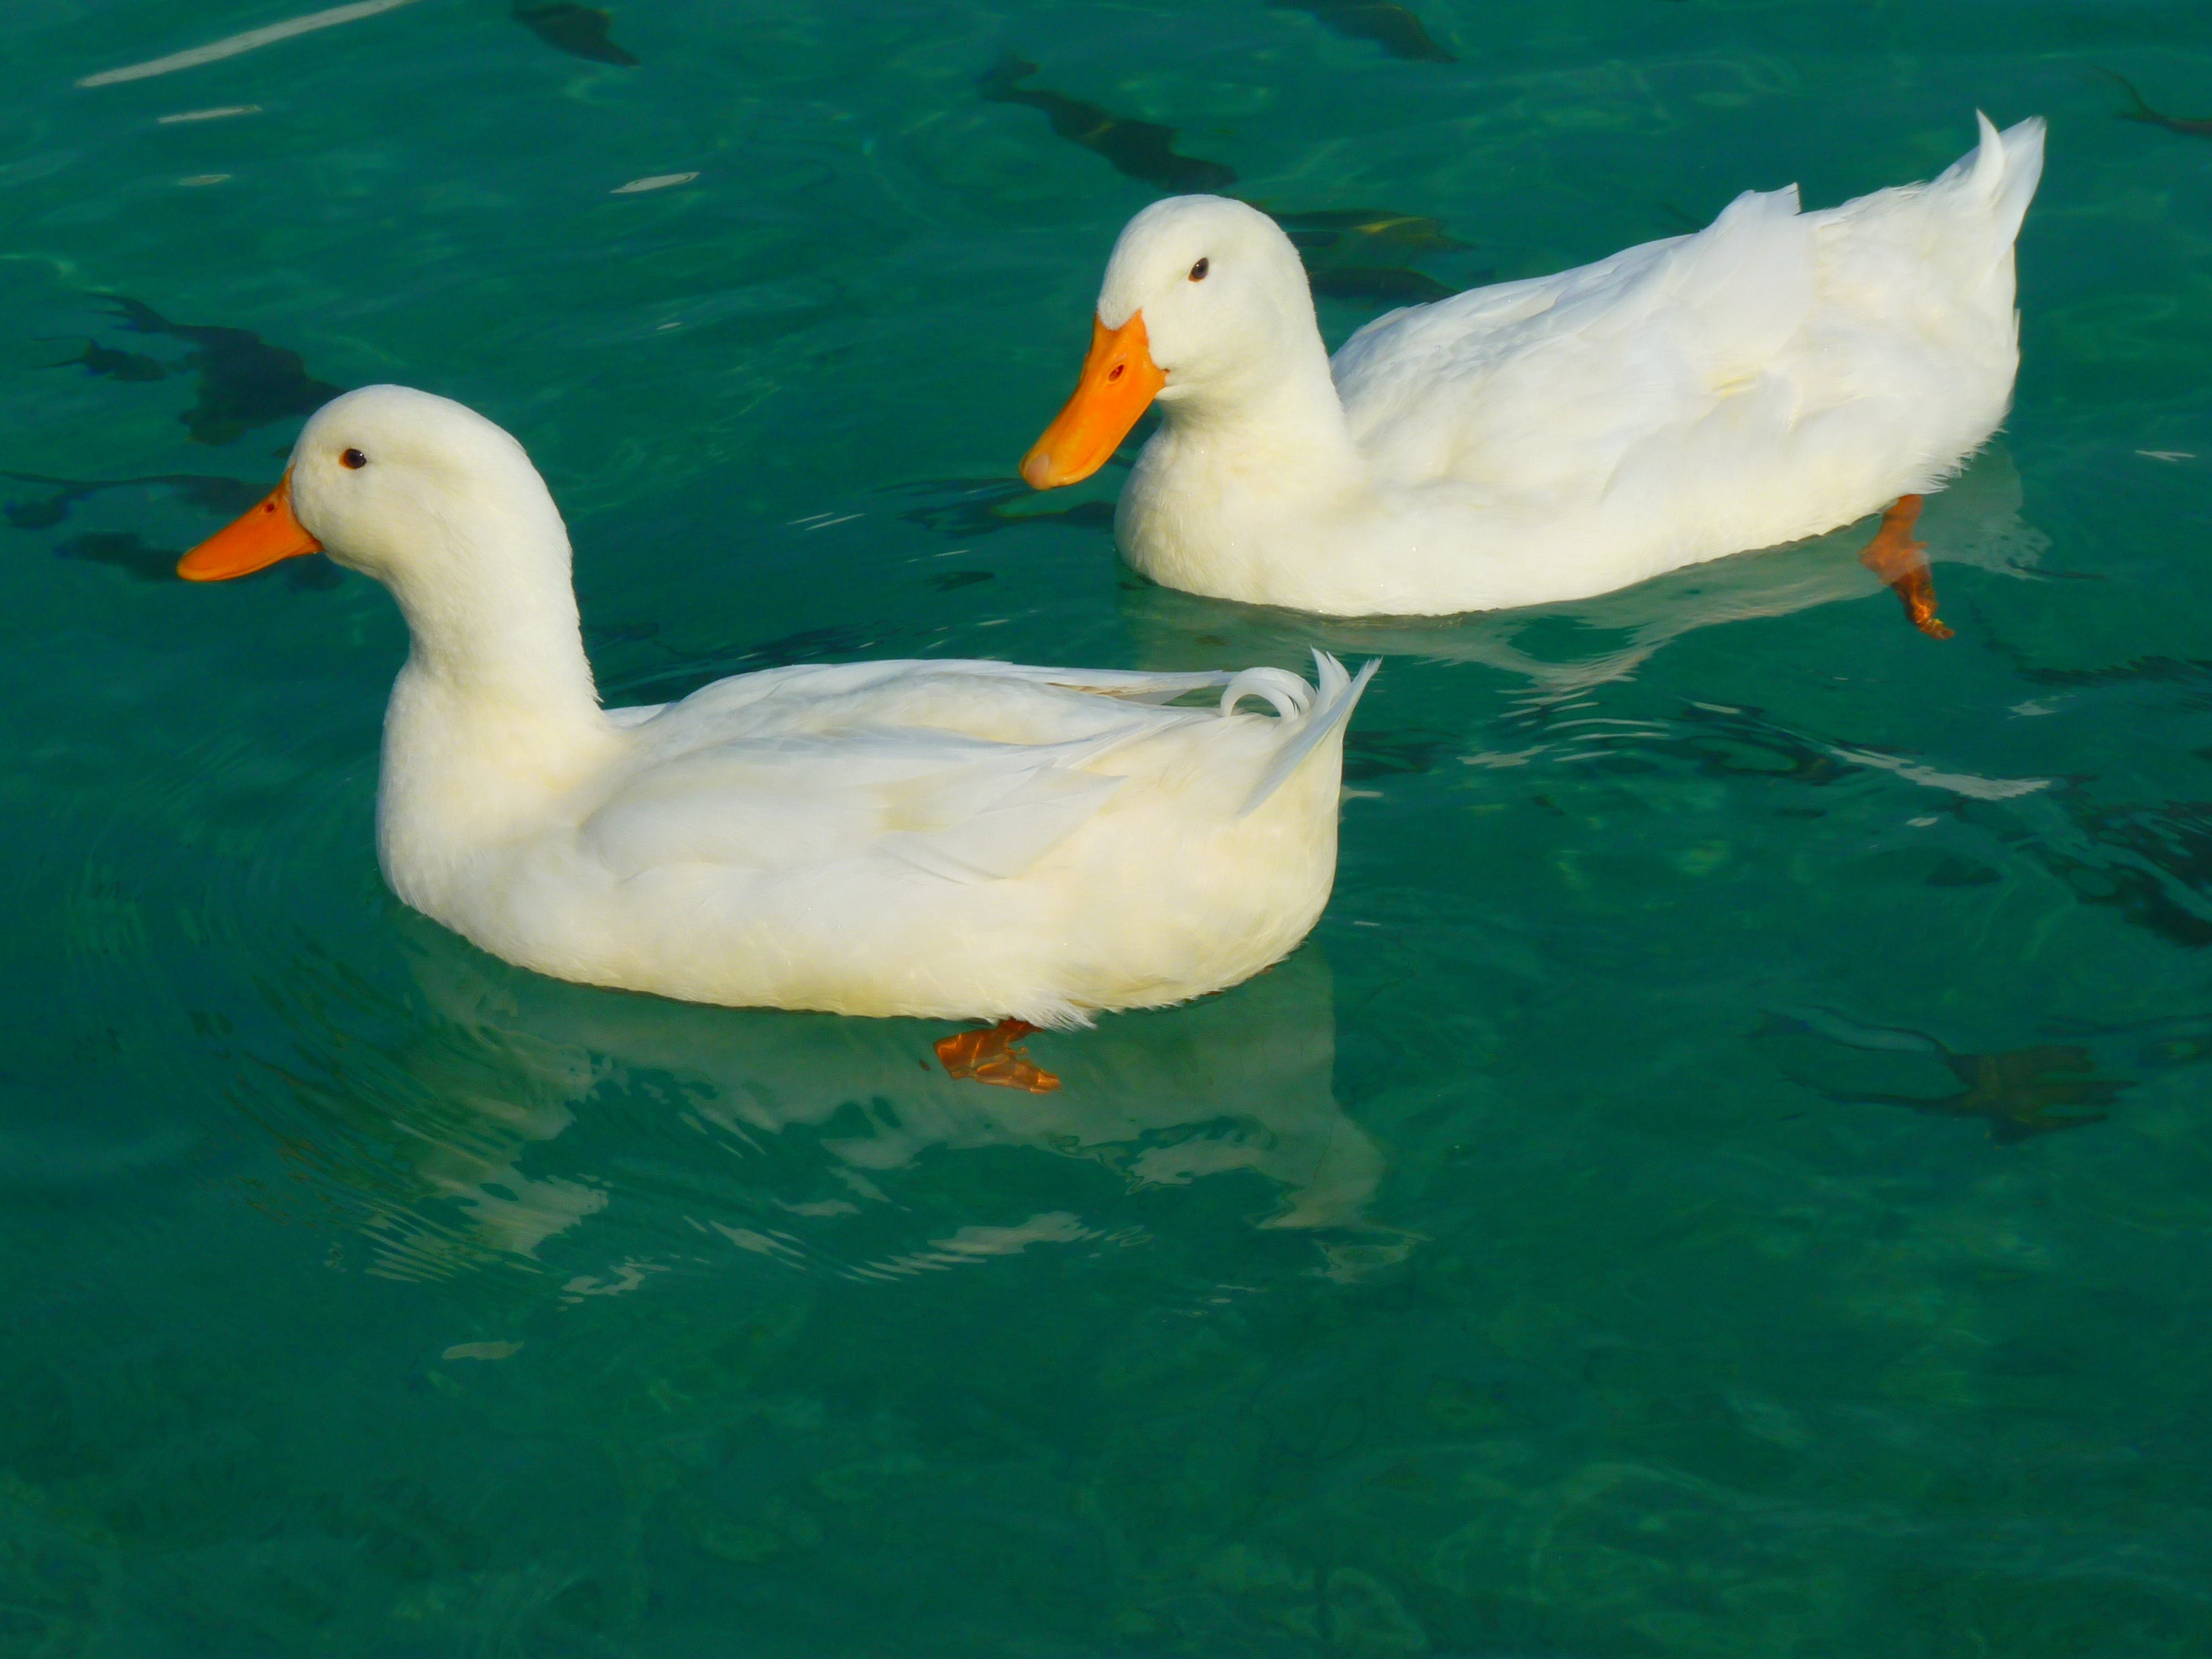 Kostenloses Stock Foto zu baden, enten, tiere, tierfotografie